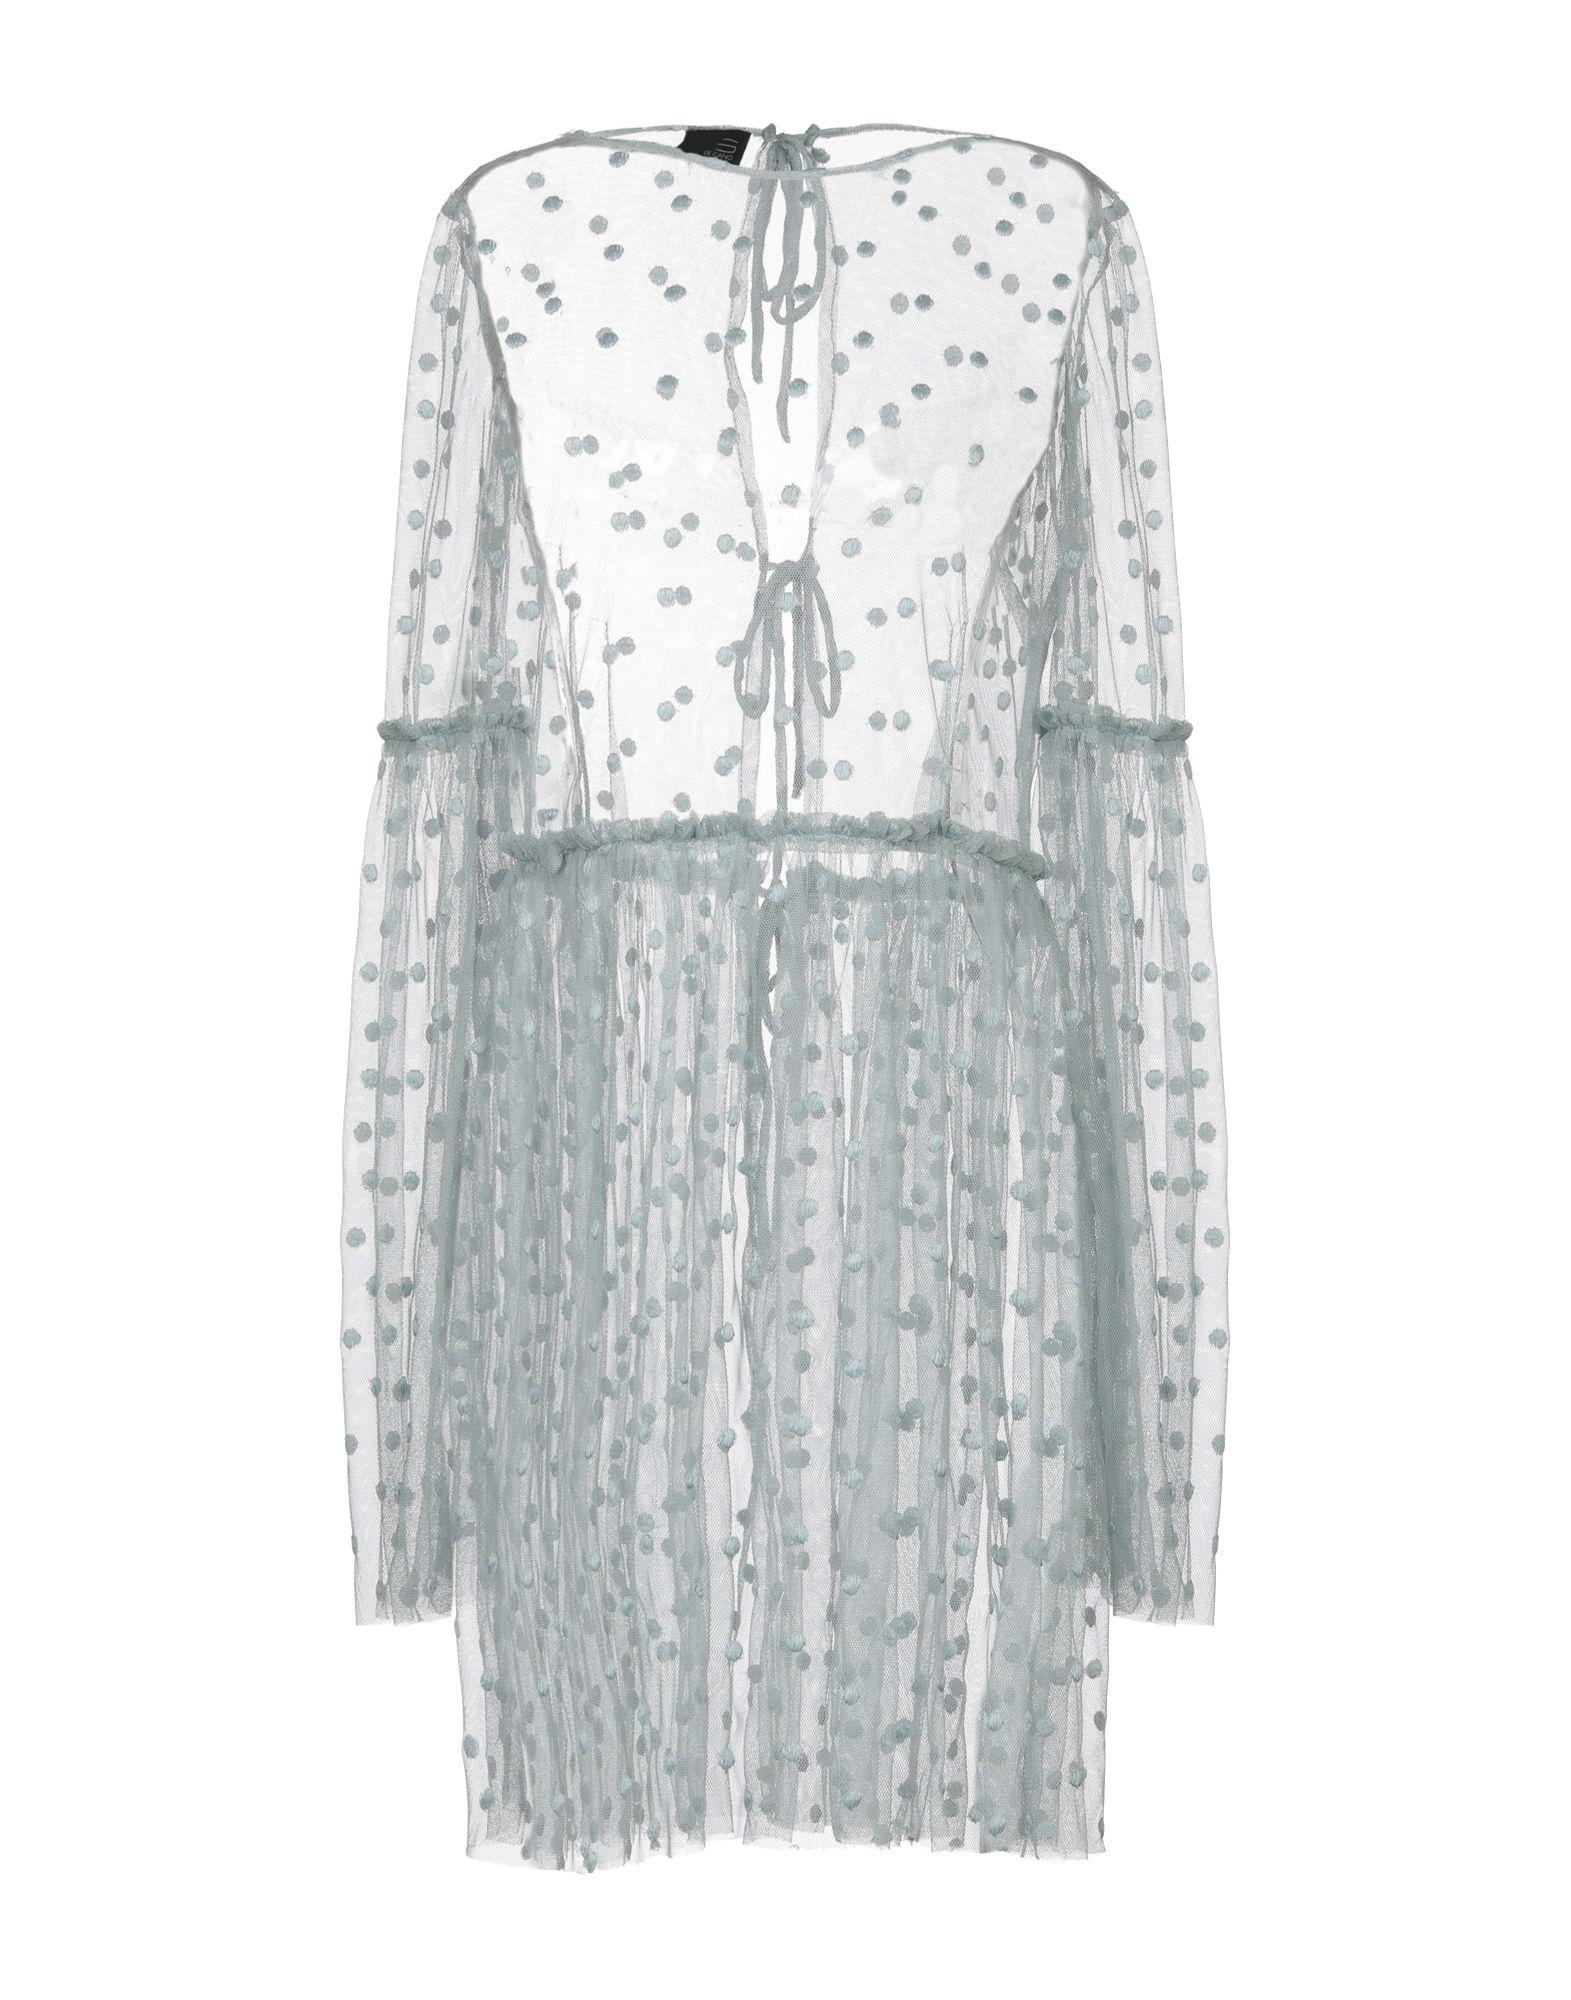 MÁSS by MATILDE CANO Короткое платье